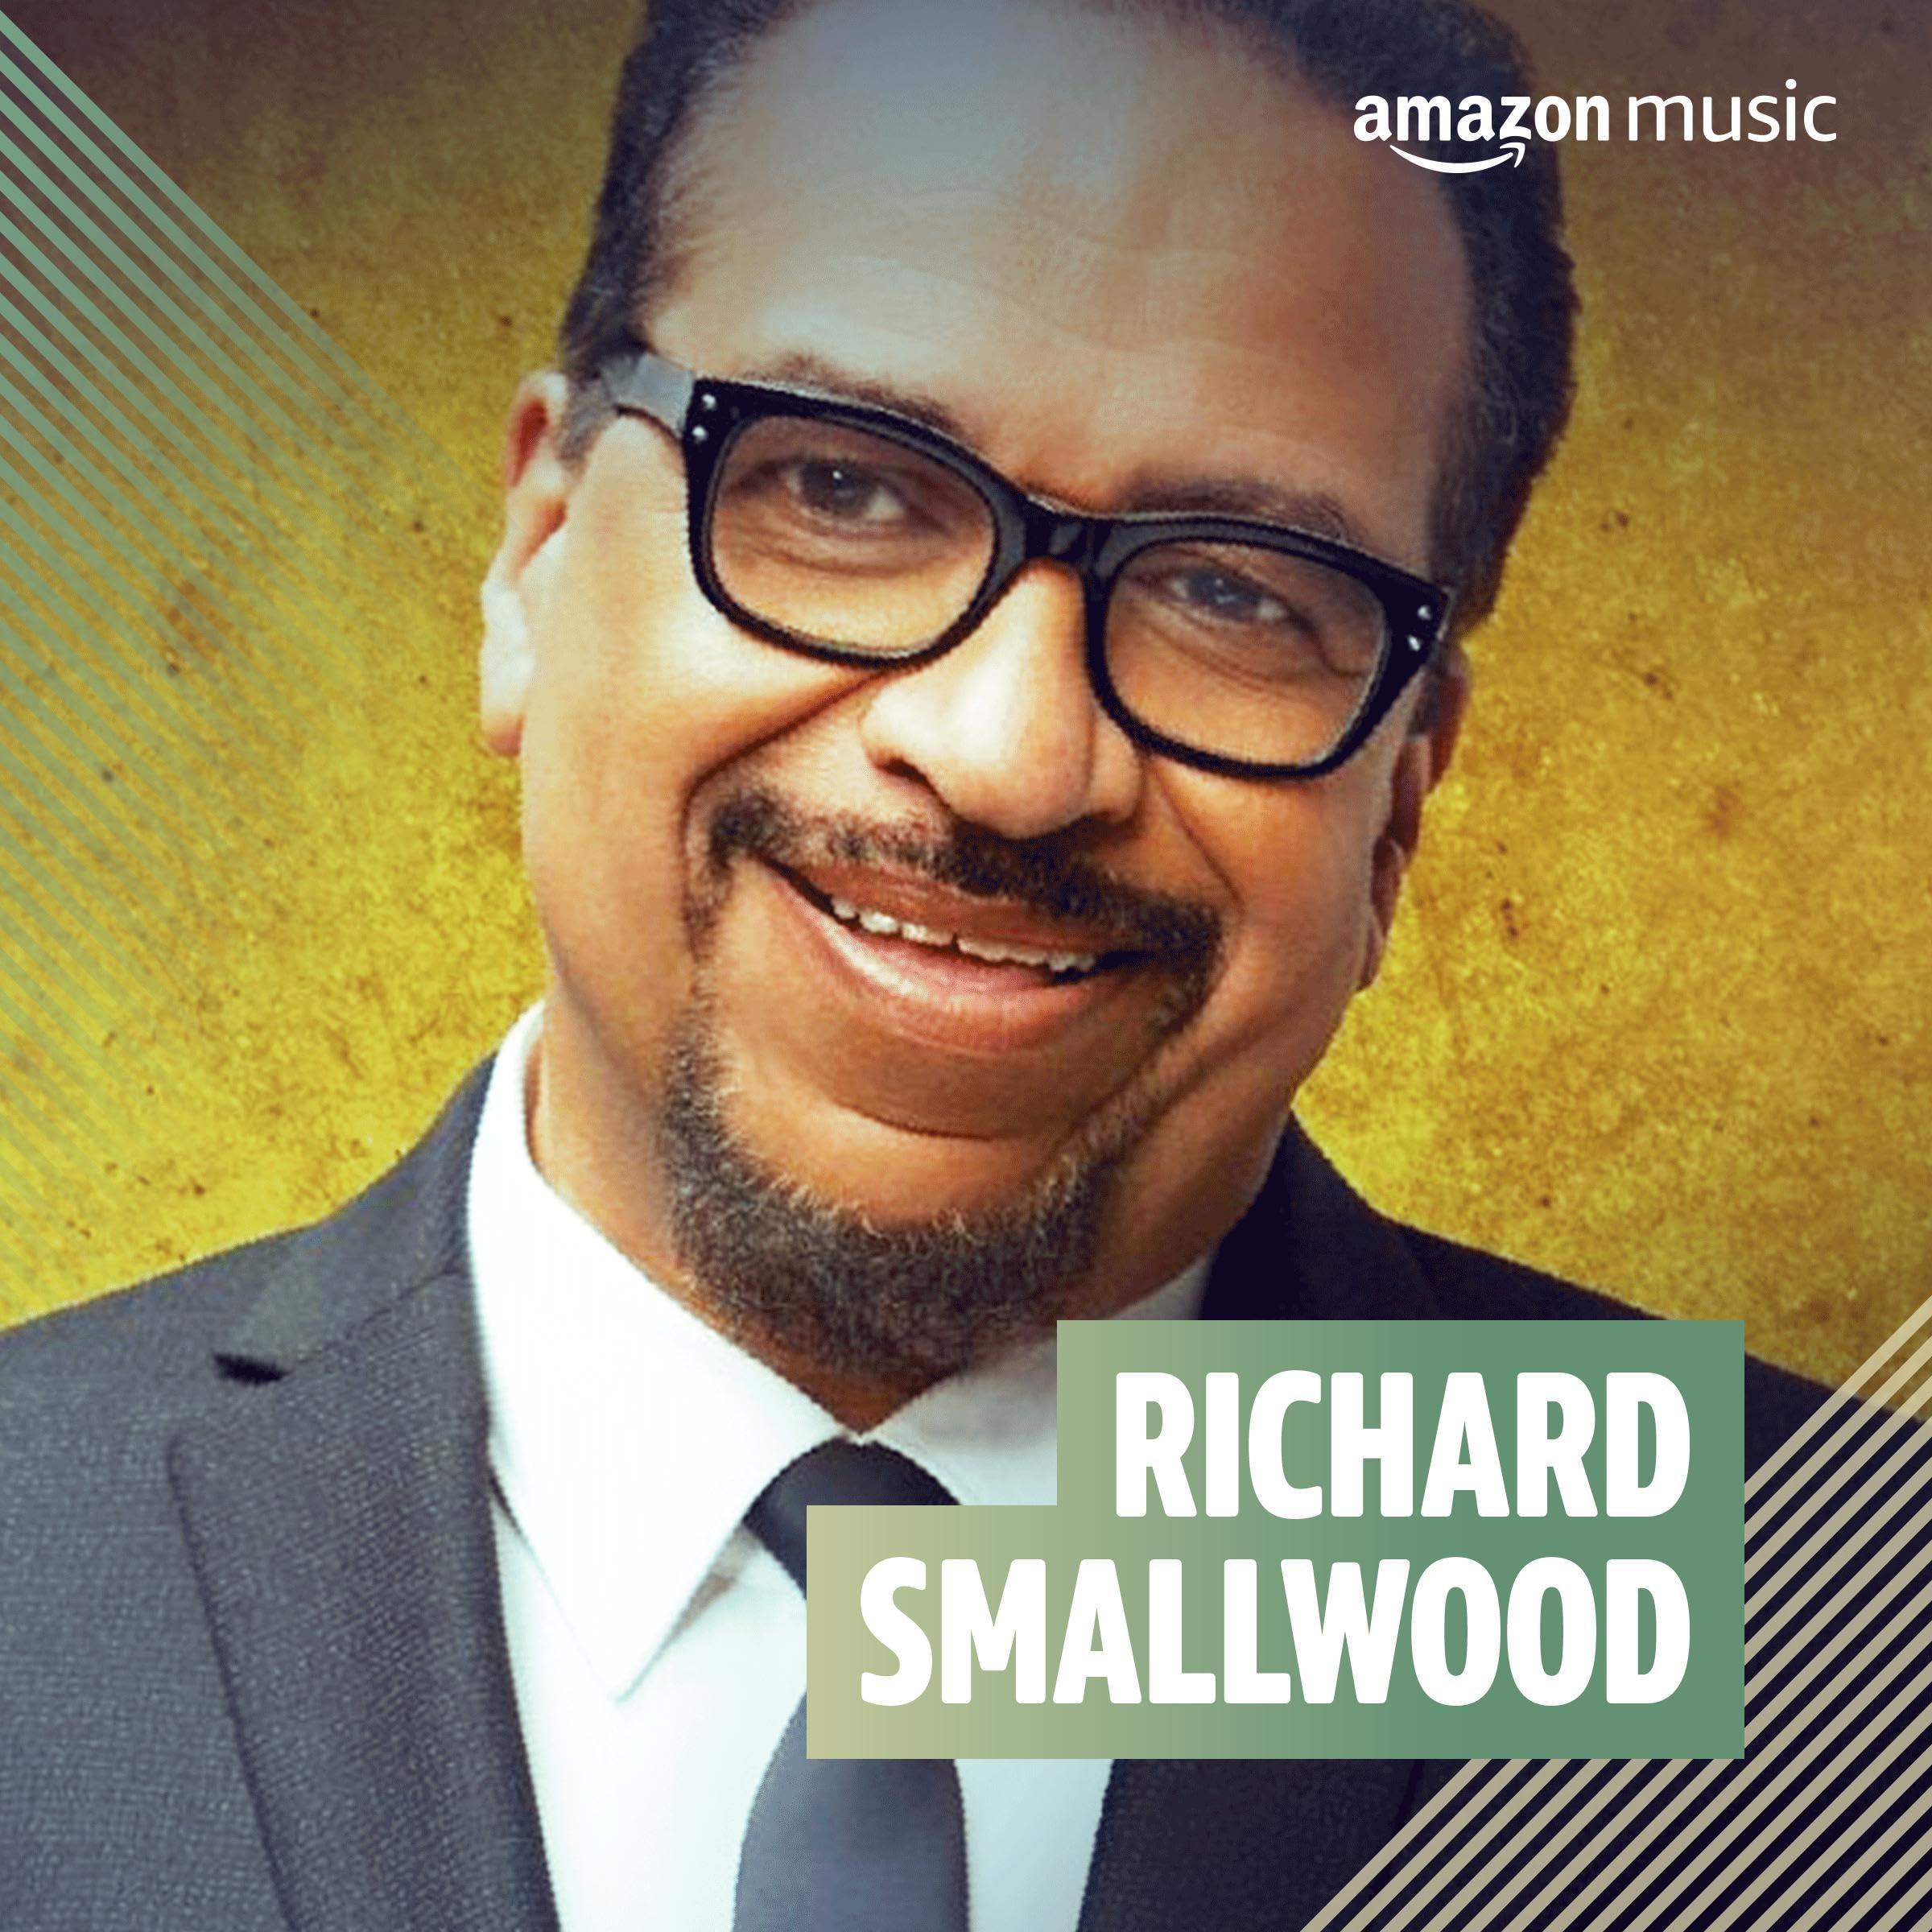 Richard Smallwood